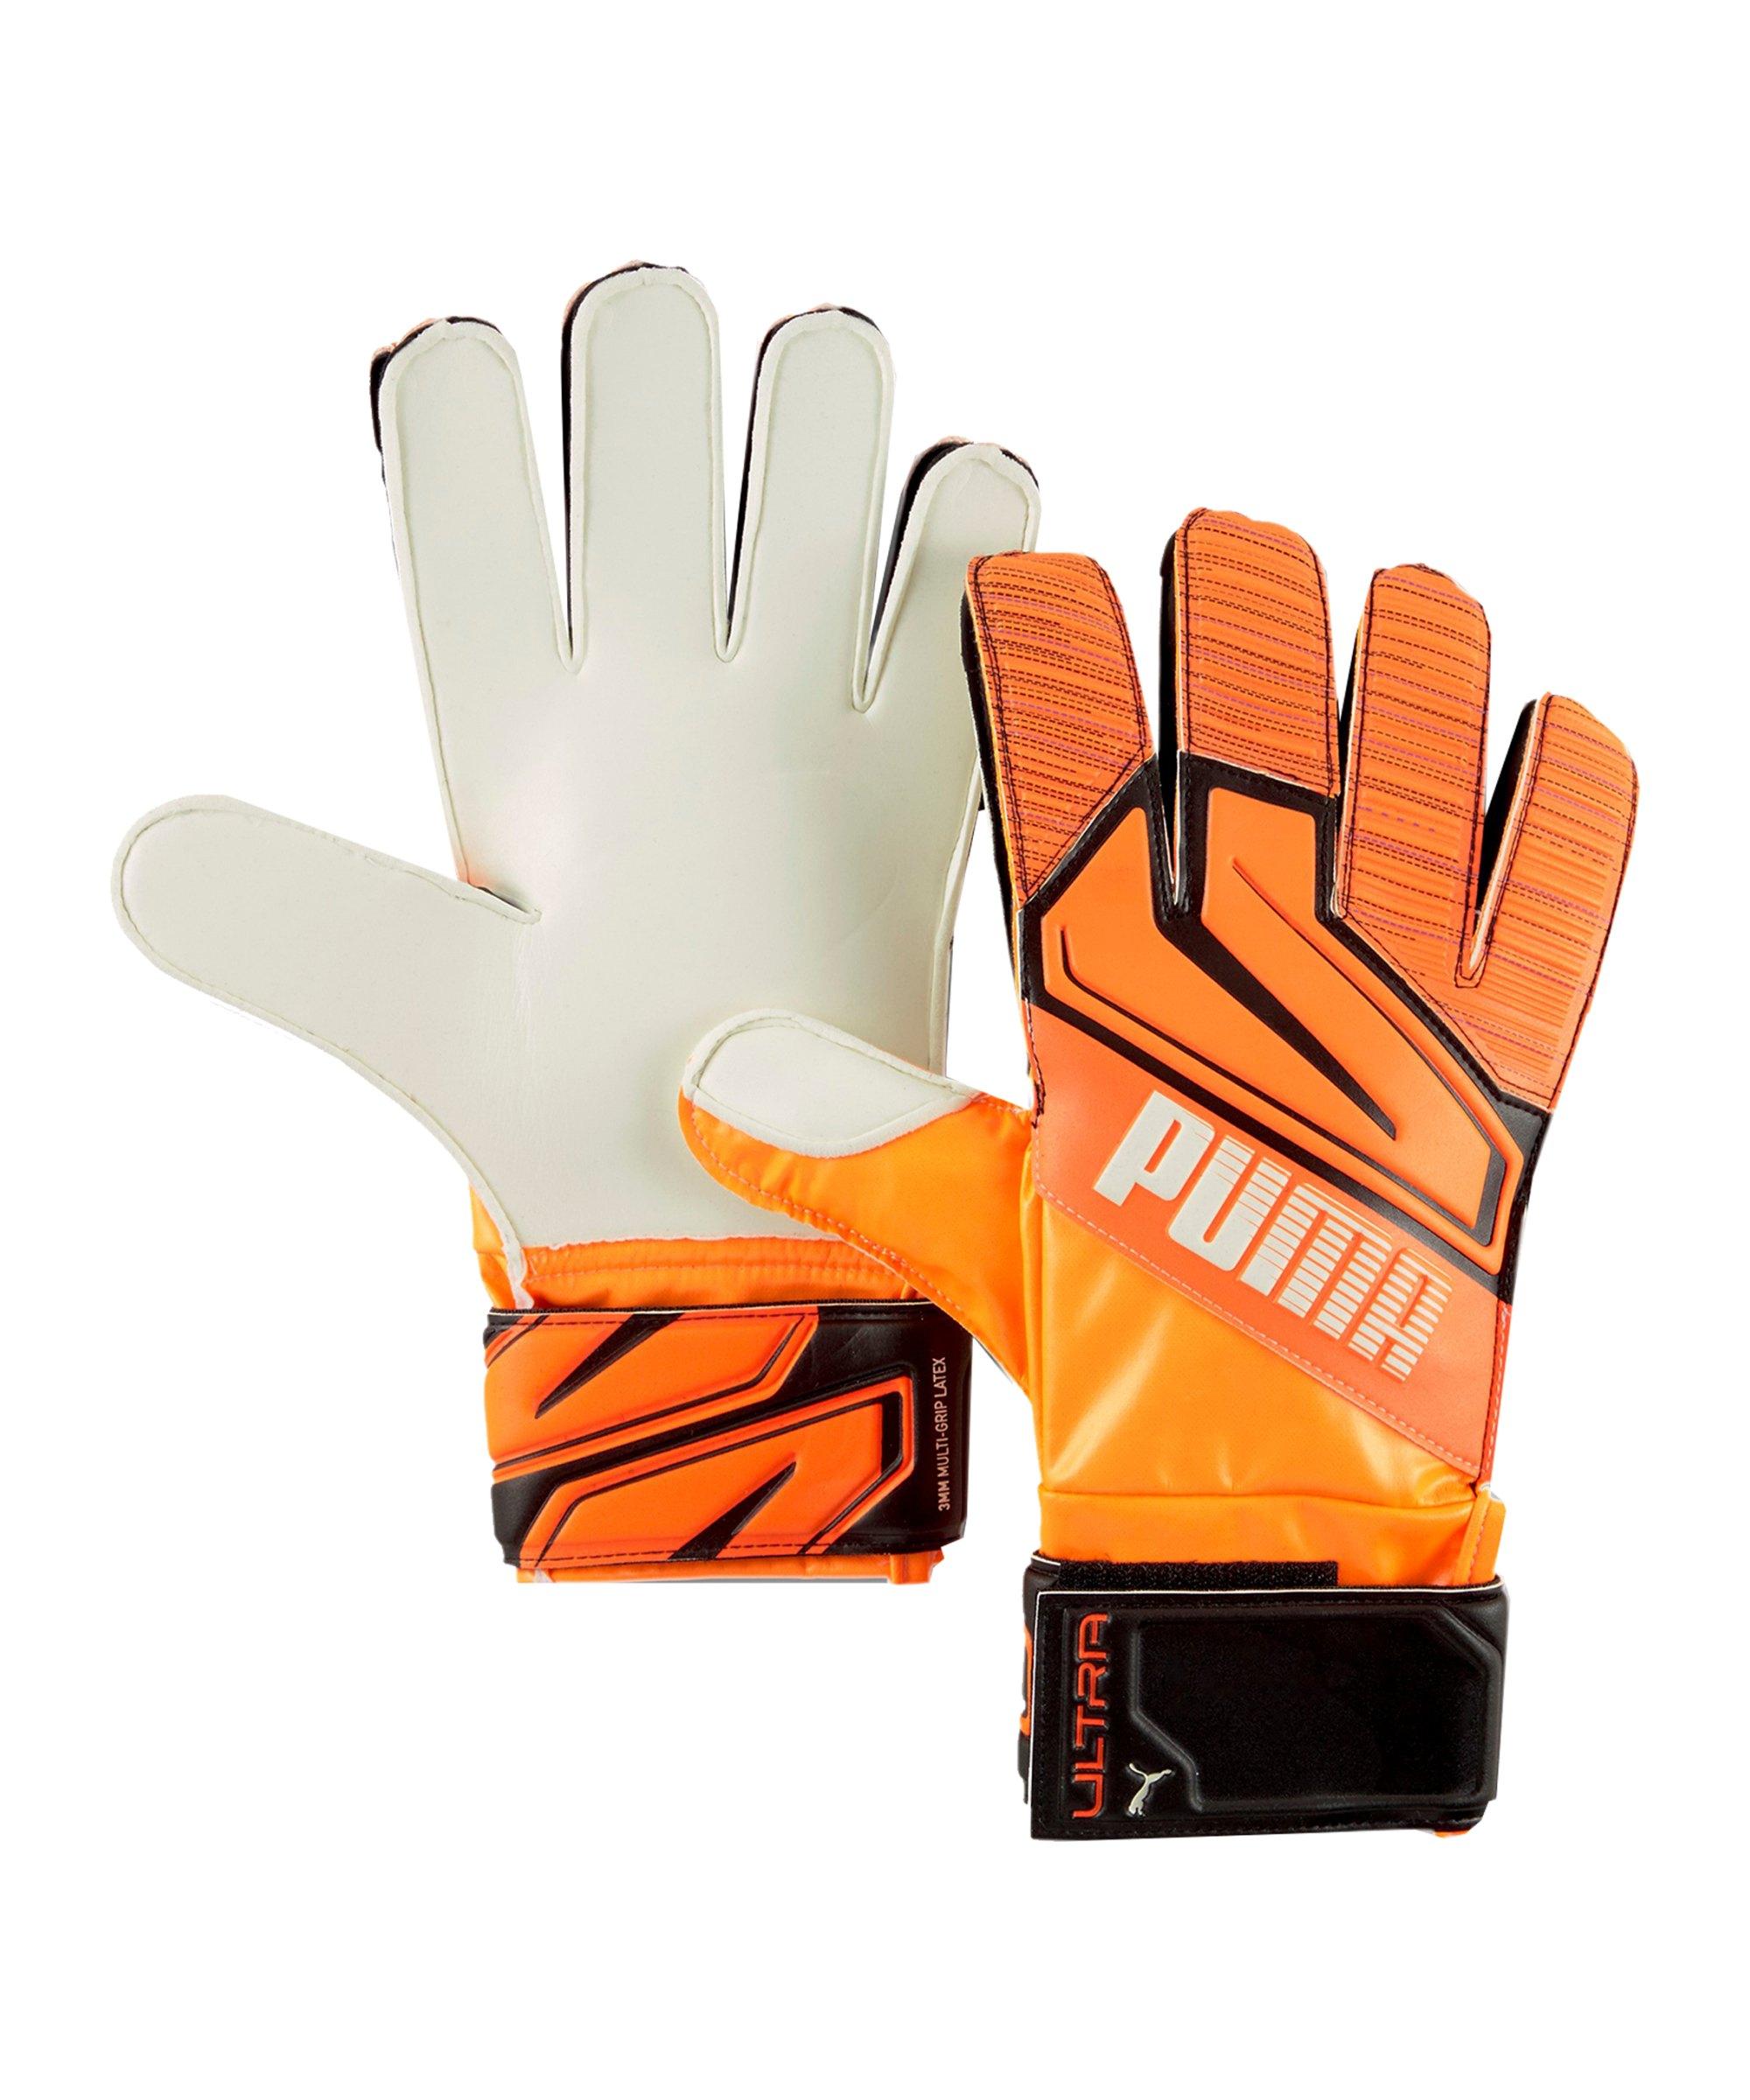 PUMA ULTRA Grip 3 RC Chasing Adrenalin Torwarthandschuh Orange F01 - orange